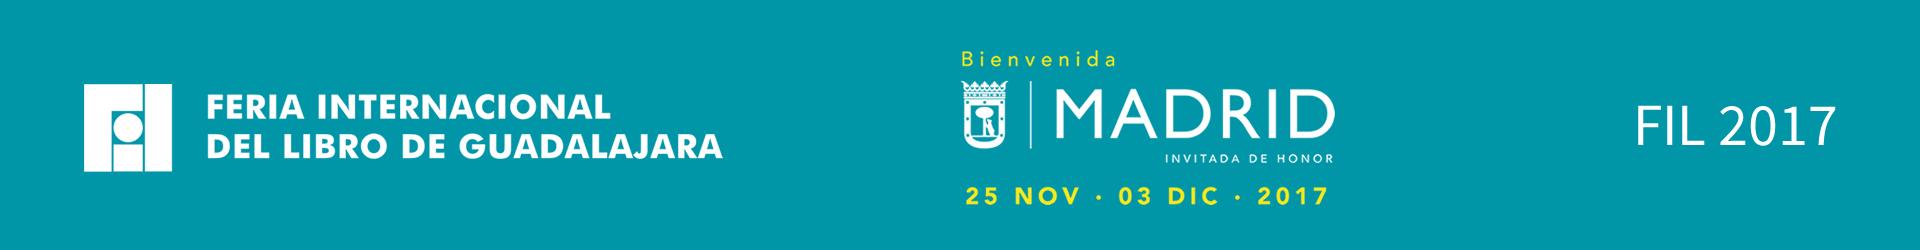 Feria Internacional del Libro Guadalajara 2015